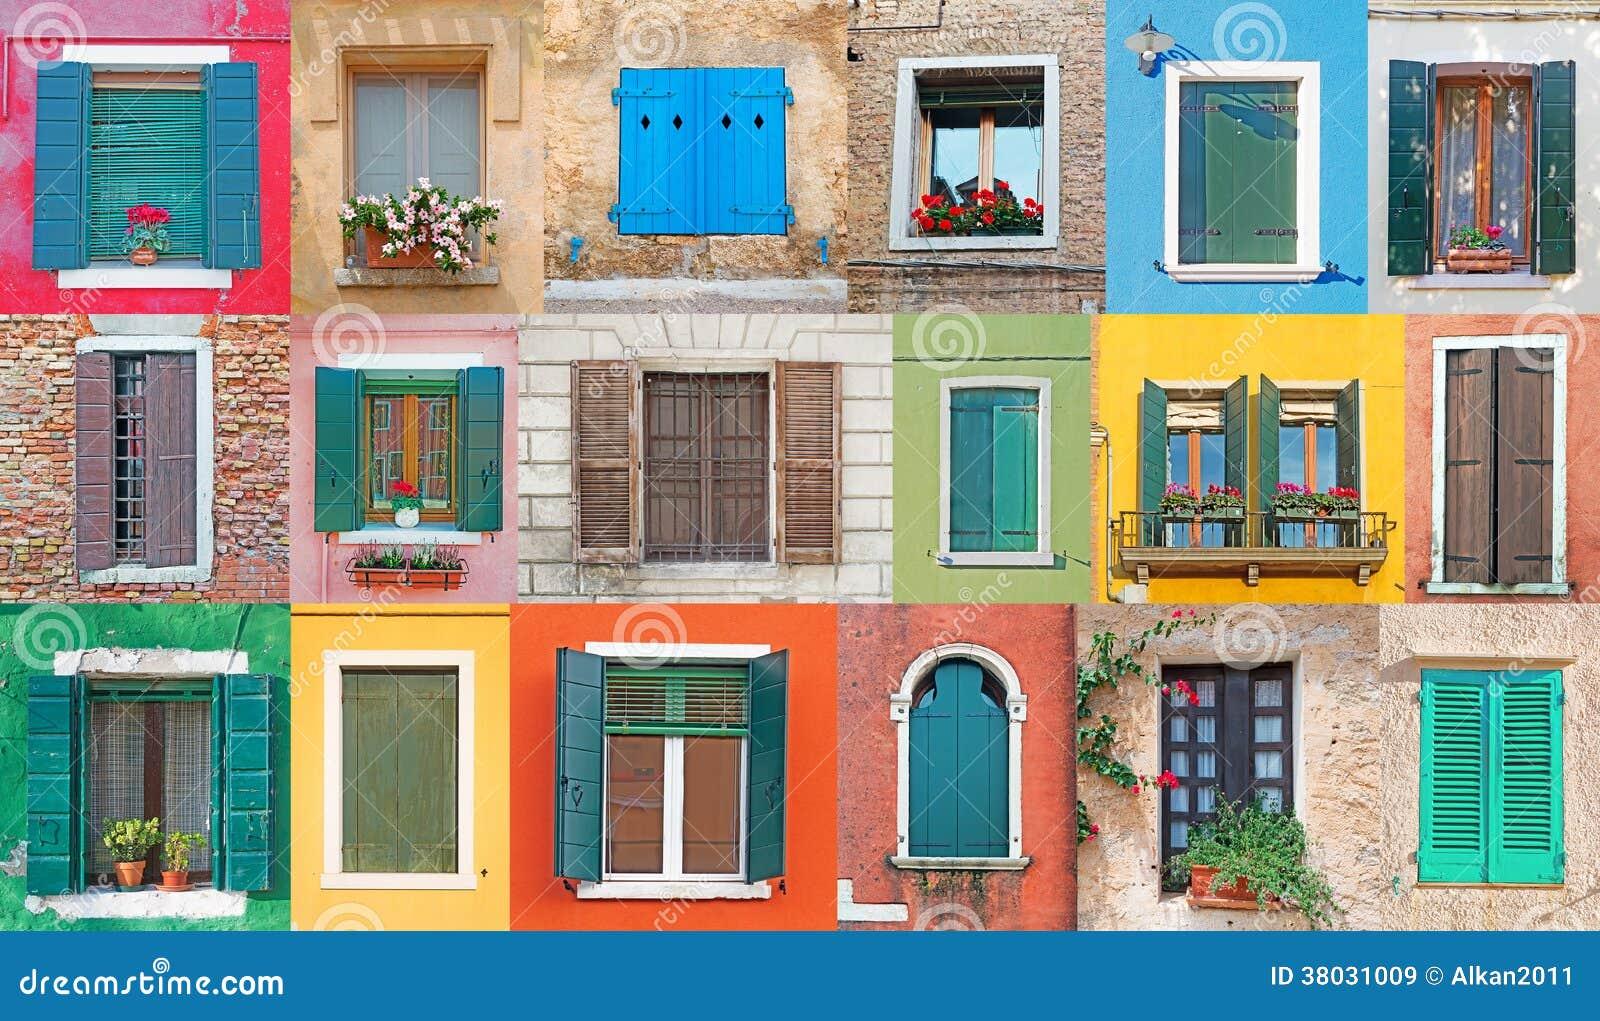 #C69705 Janelas Italianas Imagens de Stock Royalty Free Imagem: 38031009 1592 Vidros Nas Janelas